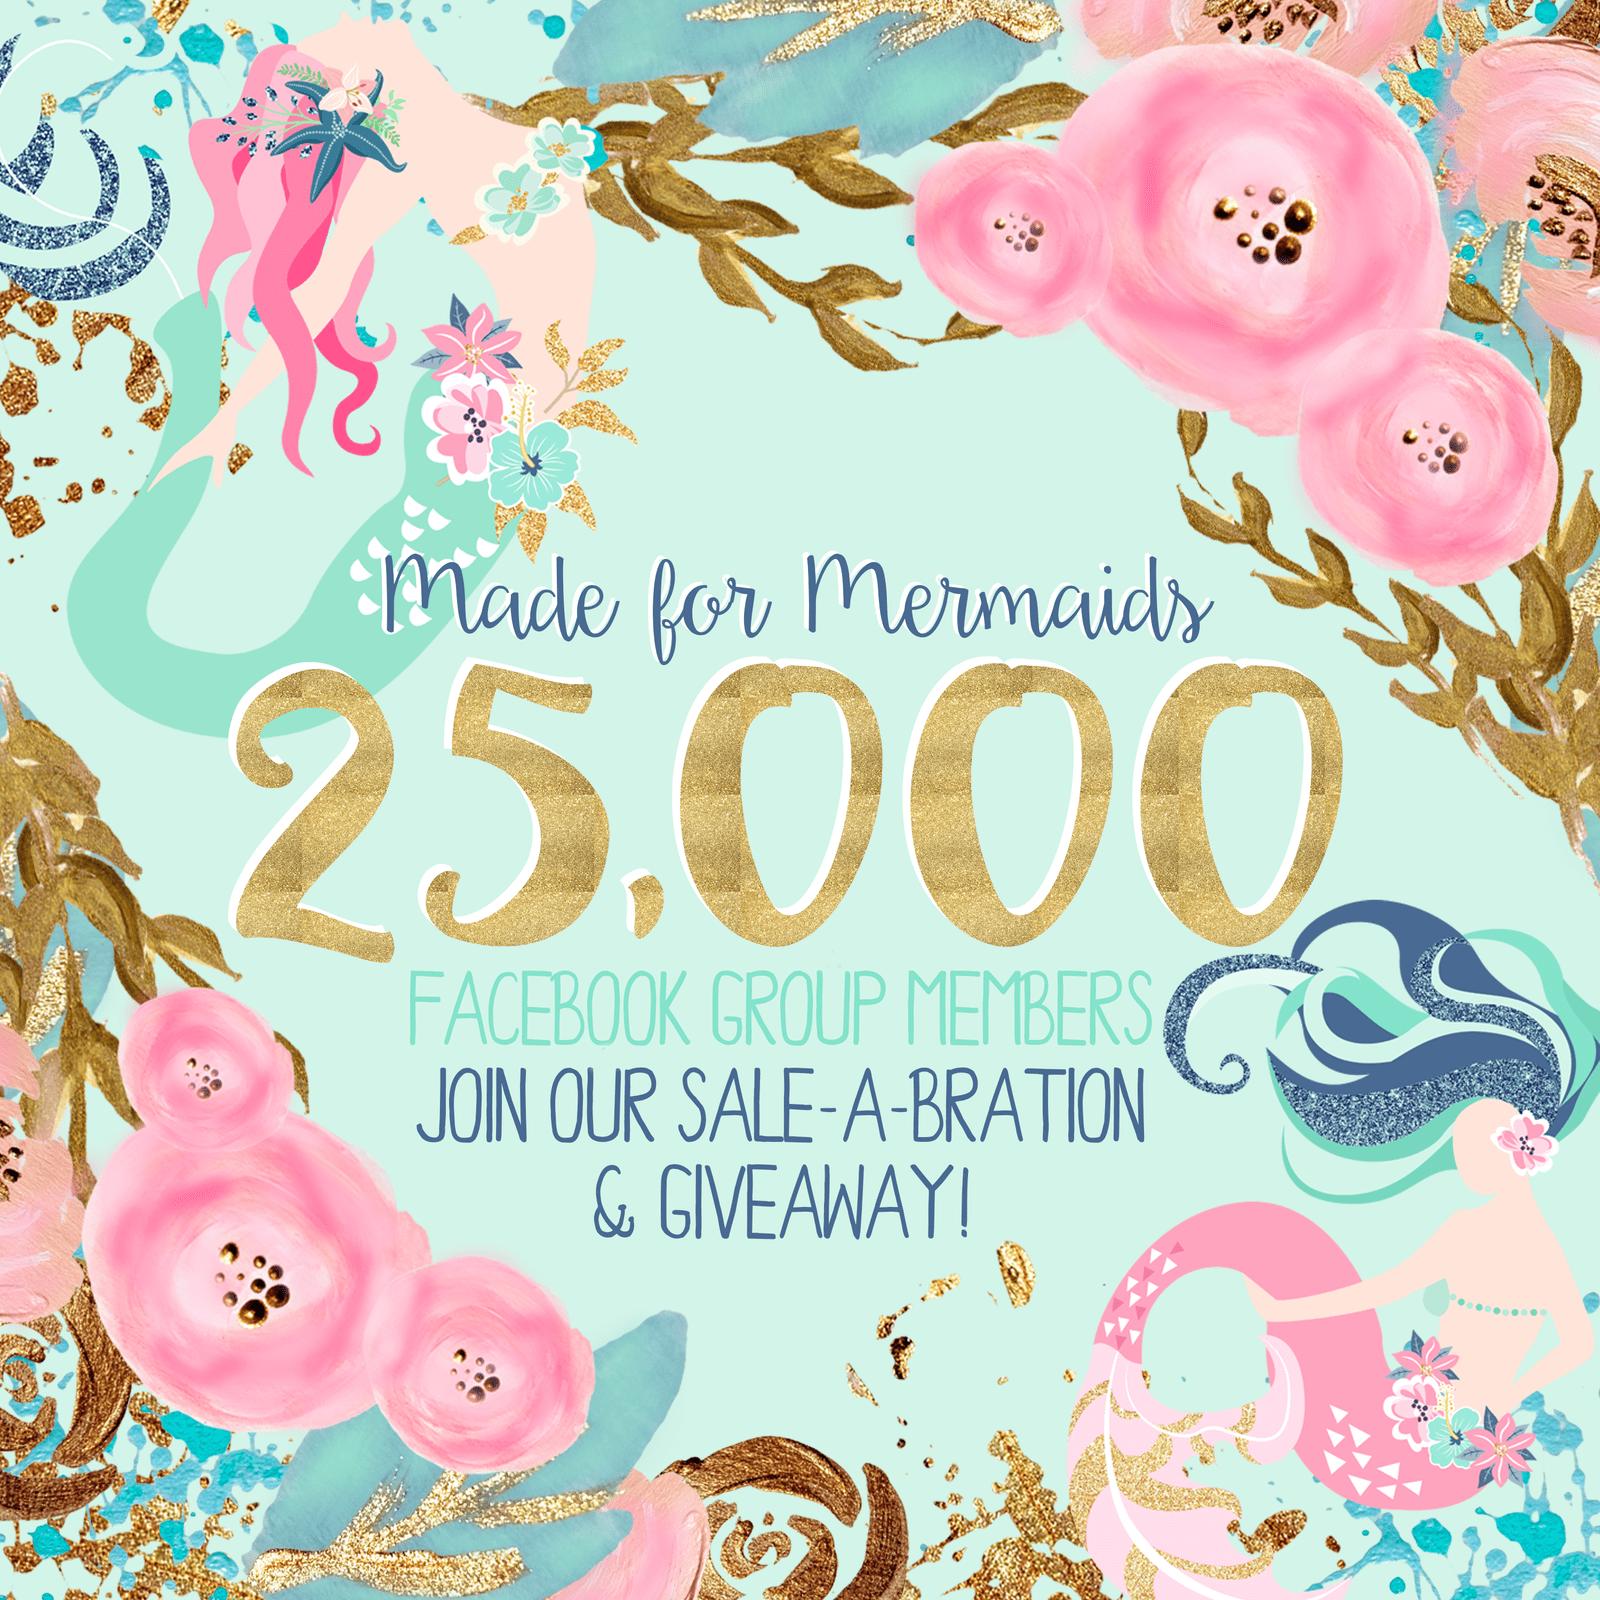 25,000 Sale-a-bration & Giveaway